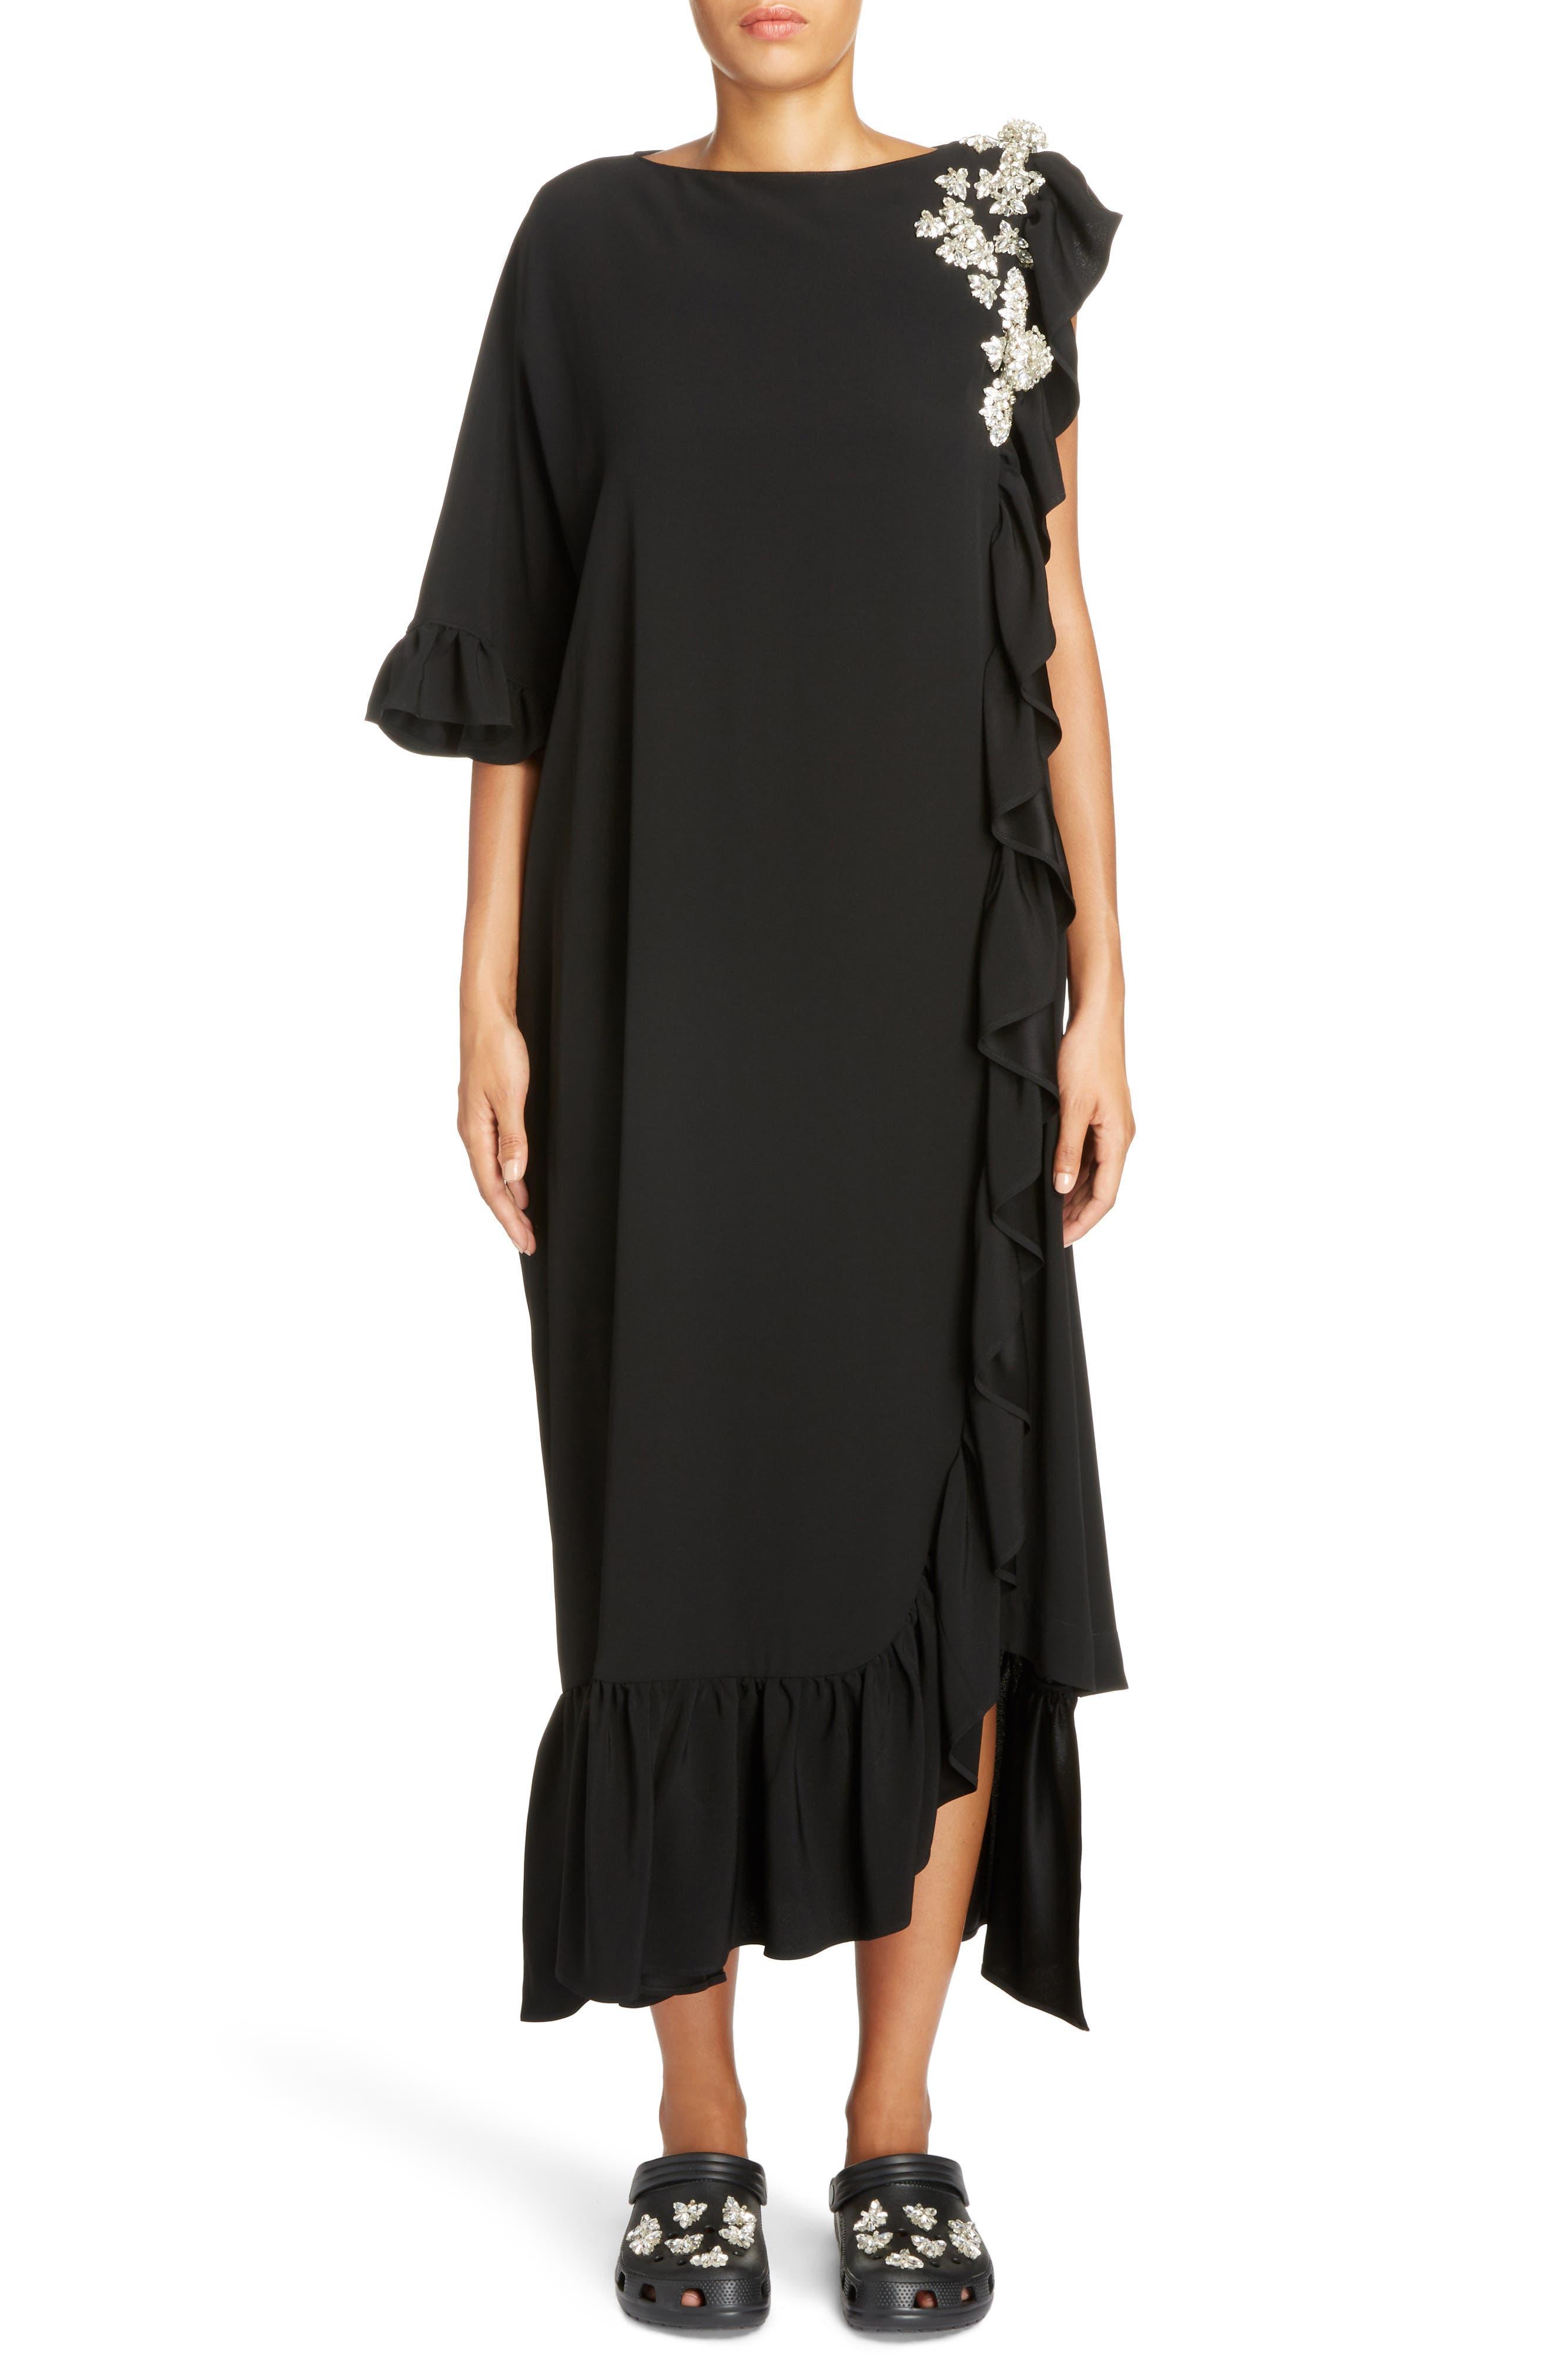 Crystal Embellished Frill Maxi Dress,                         Main,                         color, Black